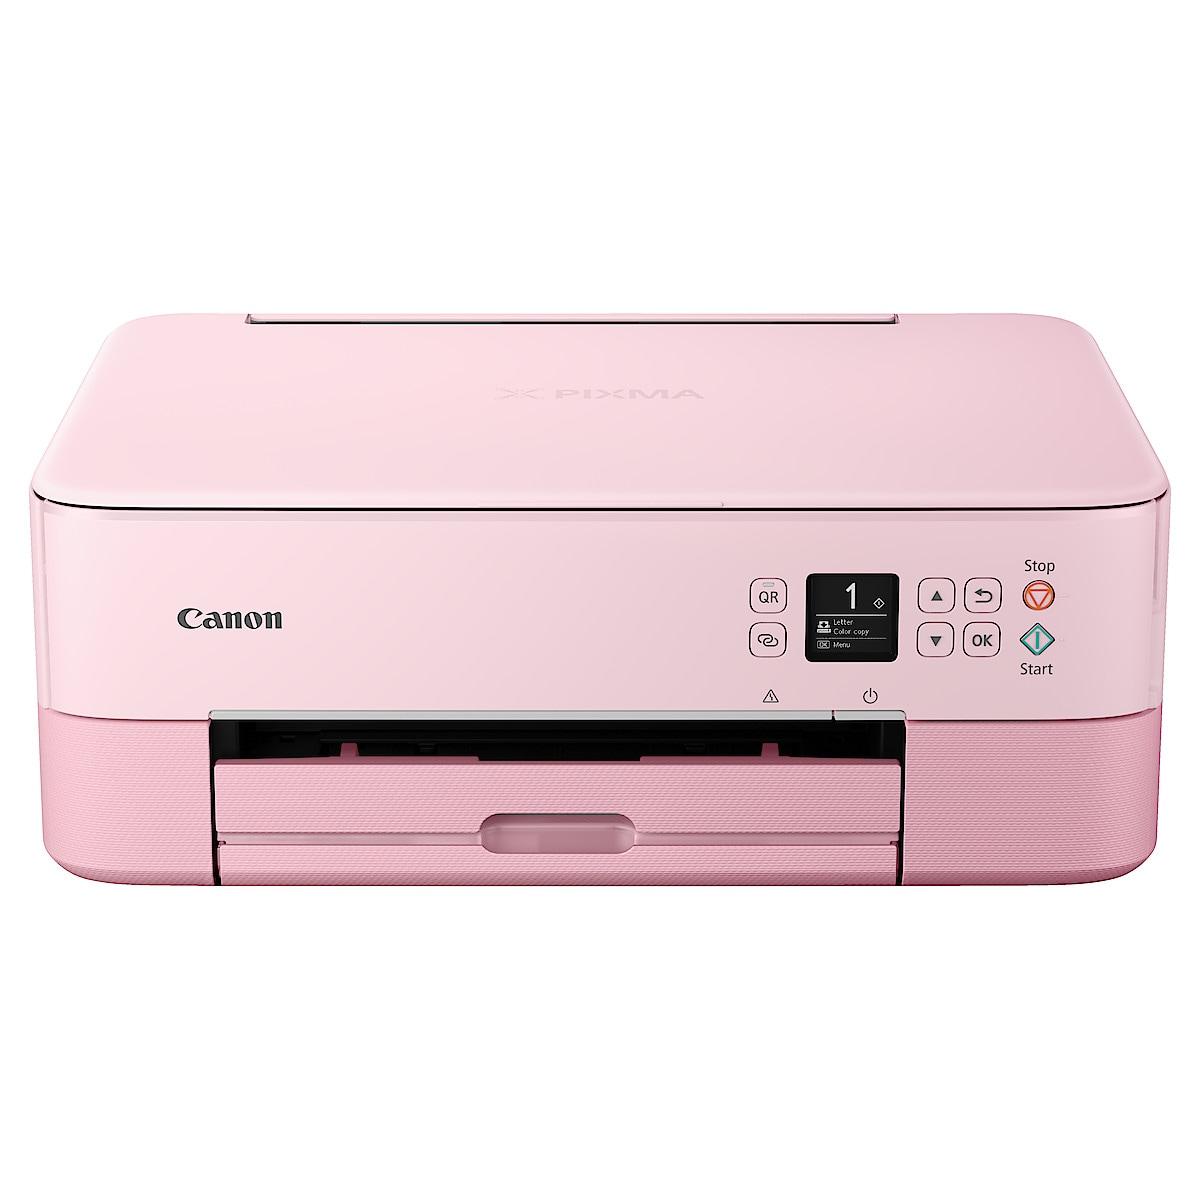 Canon Pixma TS5350 skriver